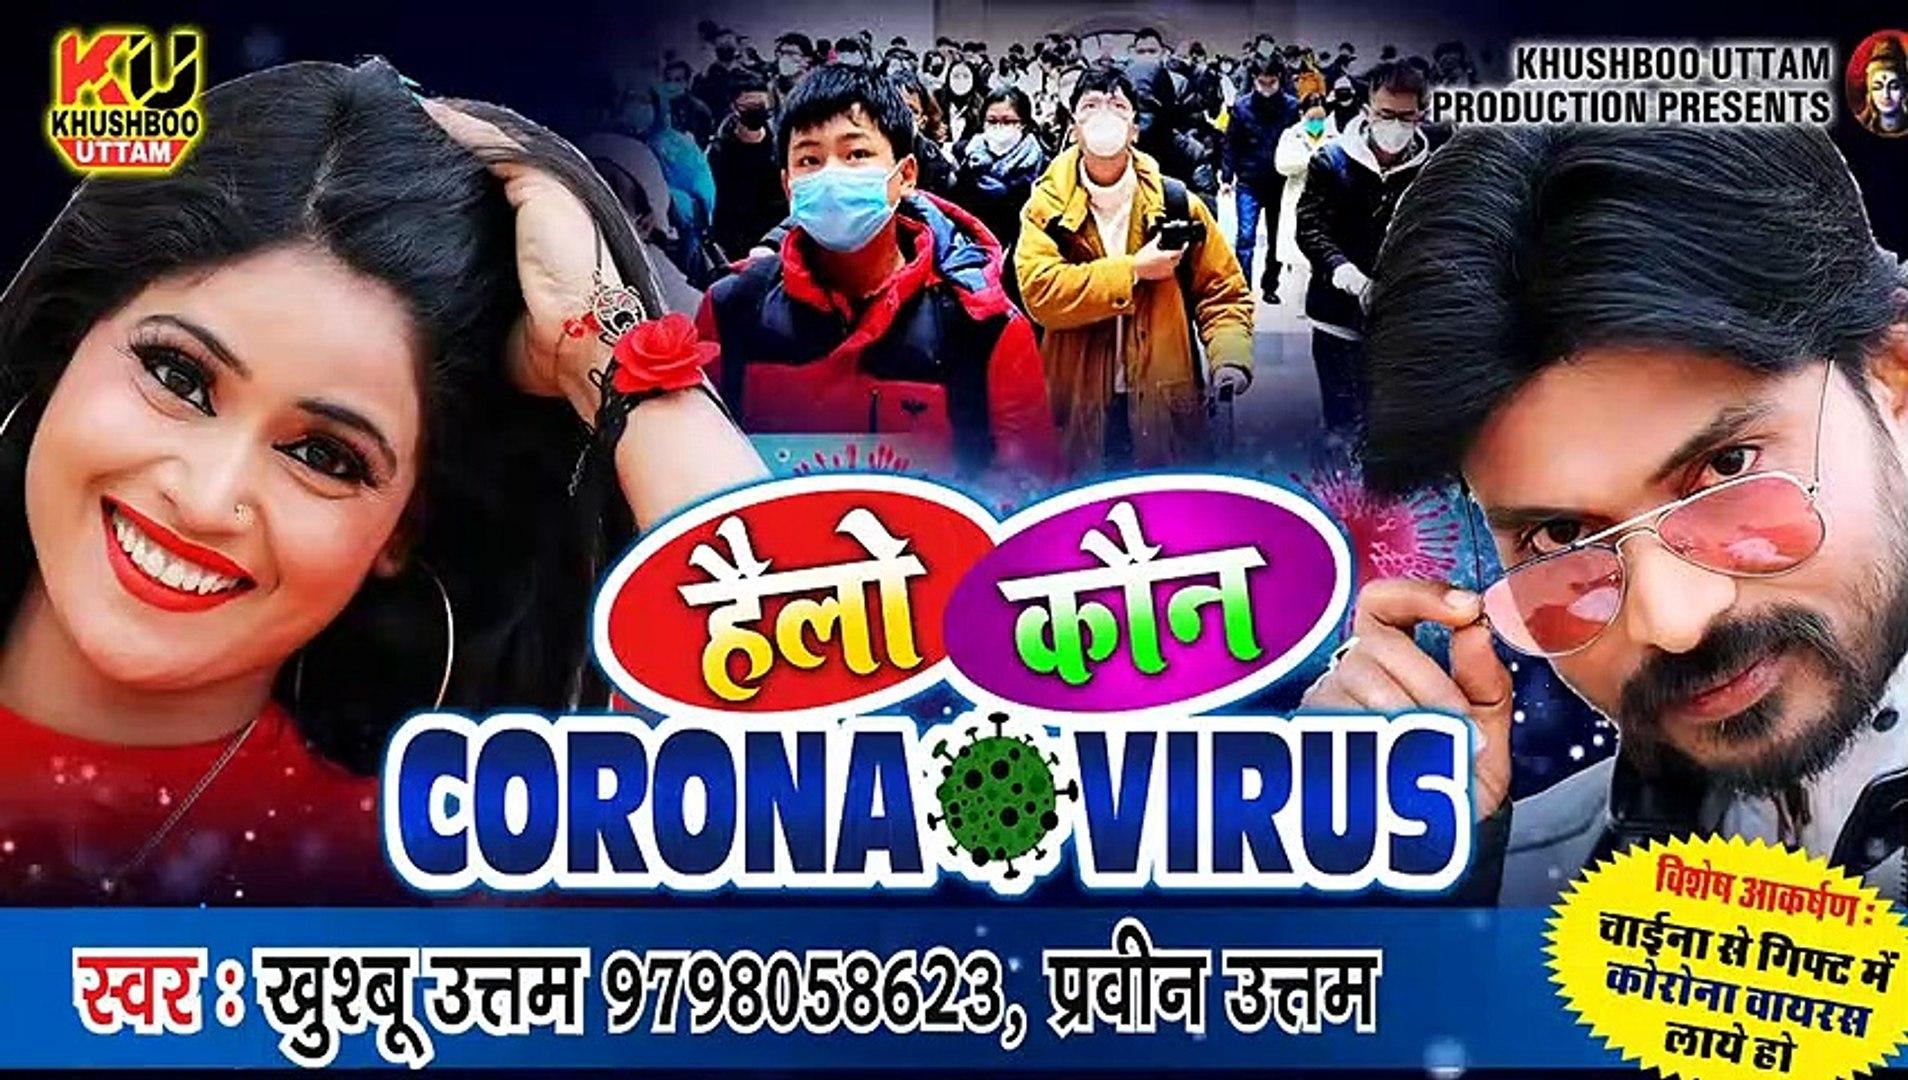 #VIDEO हैलो कौन Corona Virus | Khushboo Uttam ,Pravin Uttam | Hello Kaun | Corona Virus Song | New